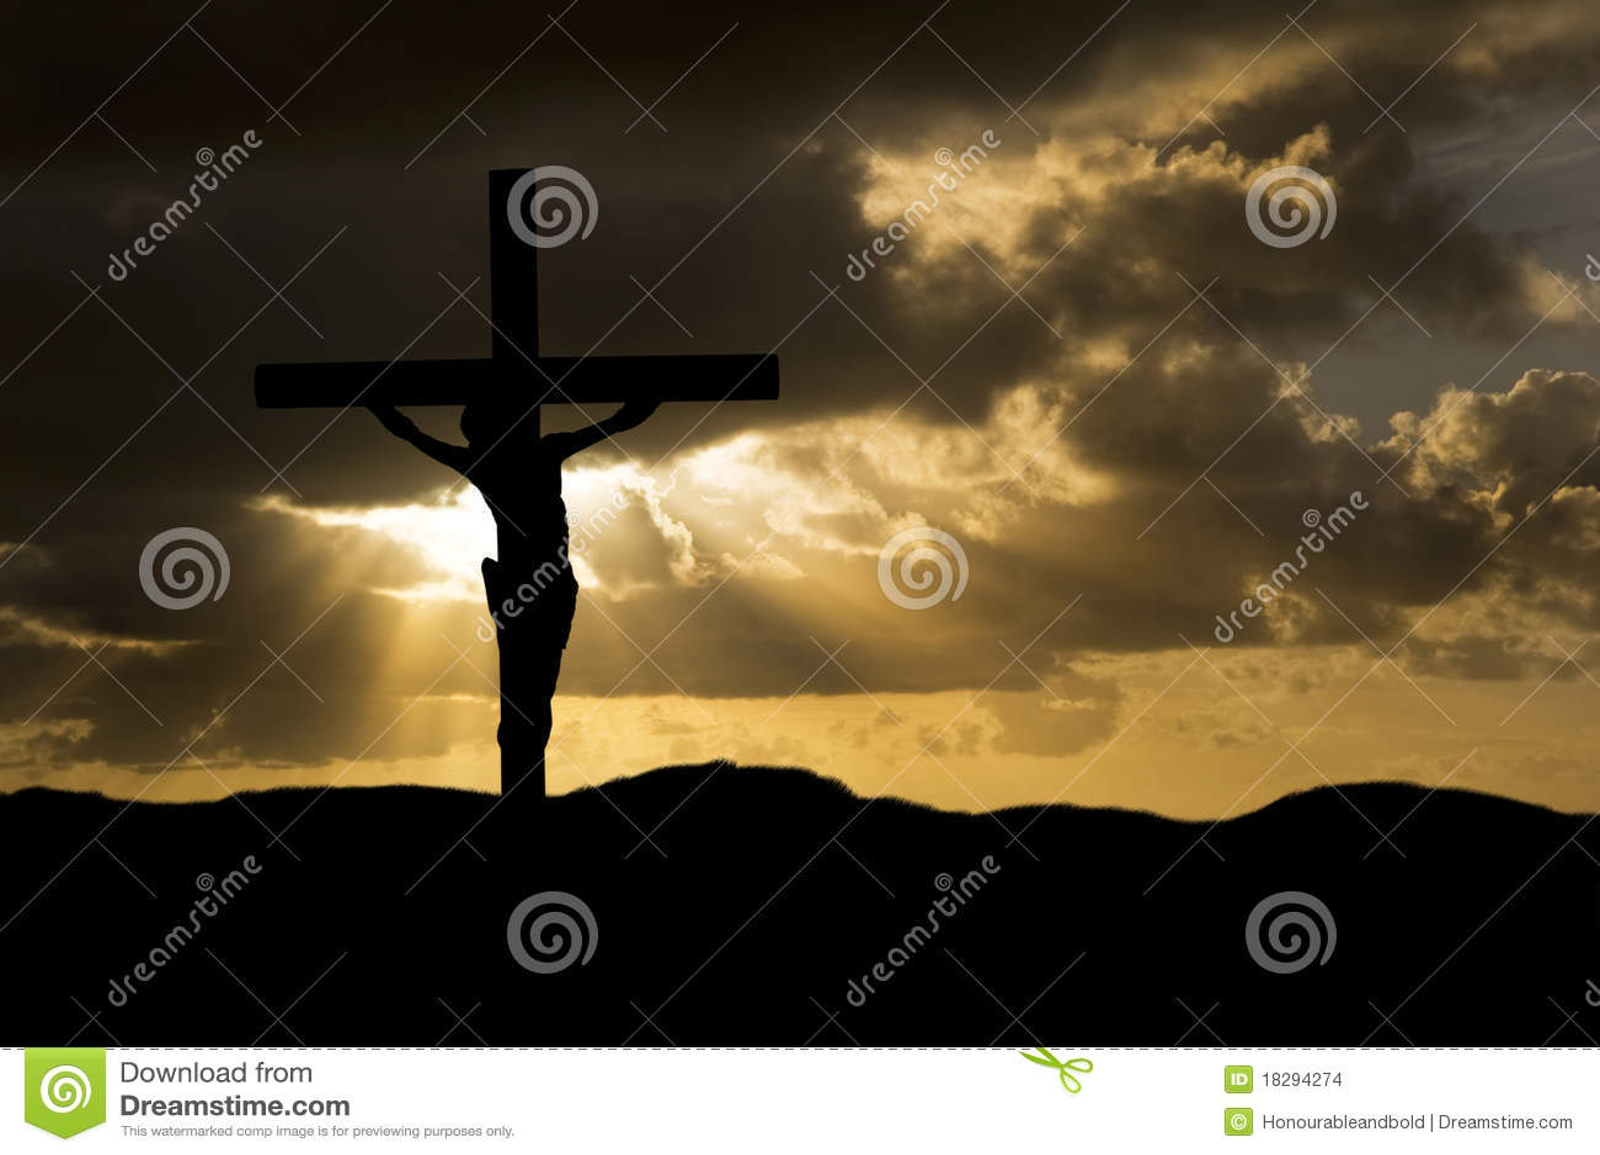 Jesus death date in Australia